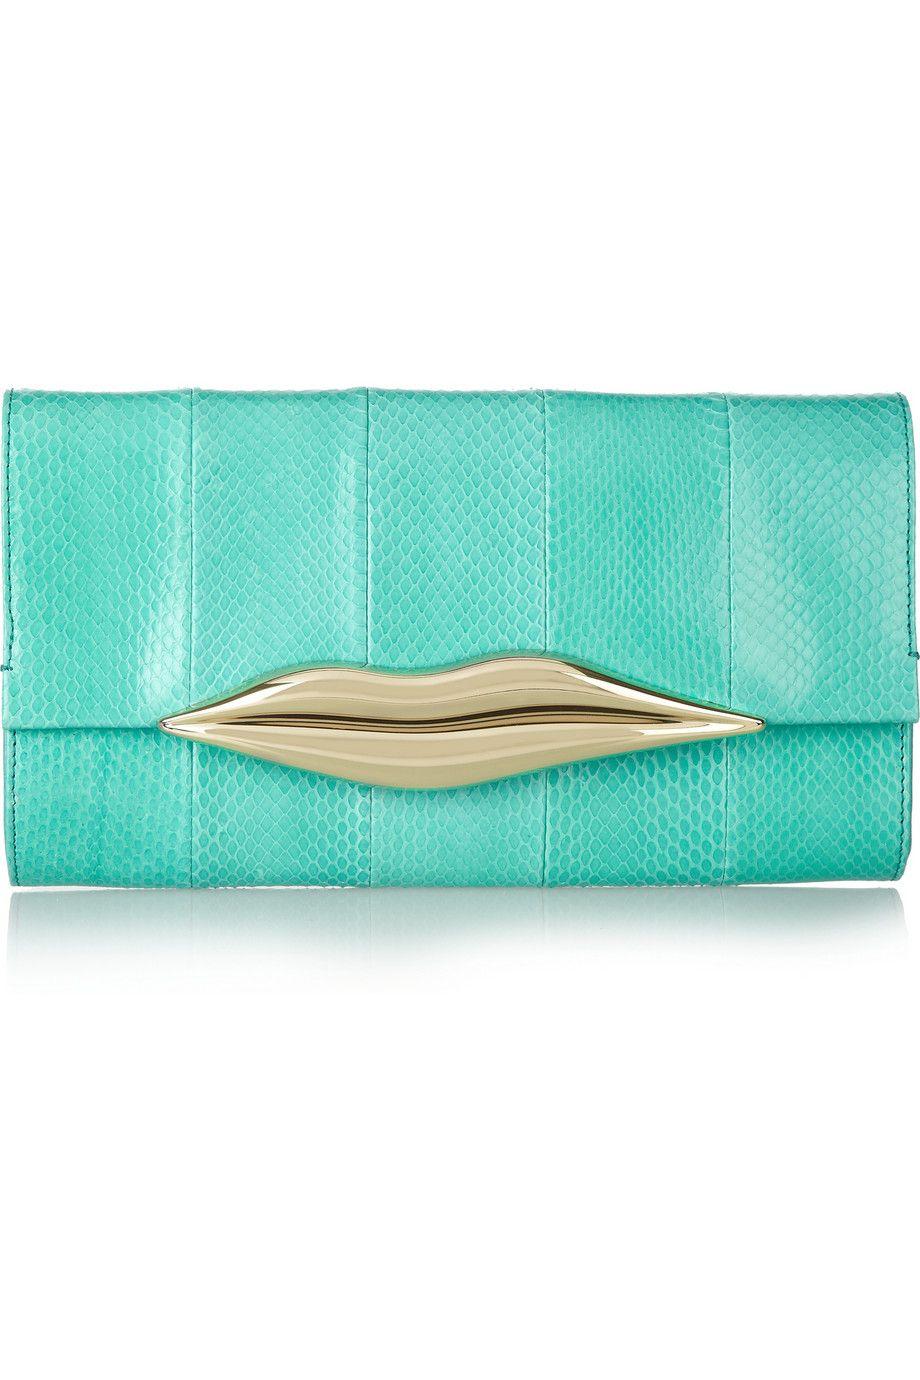 e6588d24cd Diane von Furstenberg - Carolina Lips elaphe and leather clutch ...